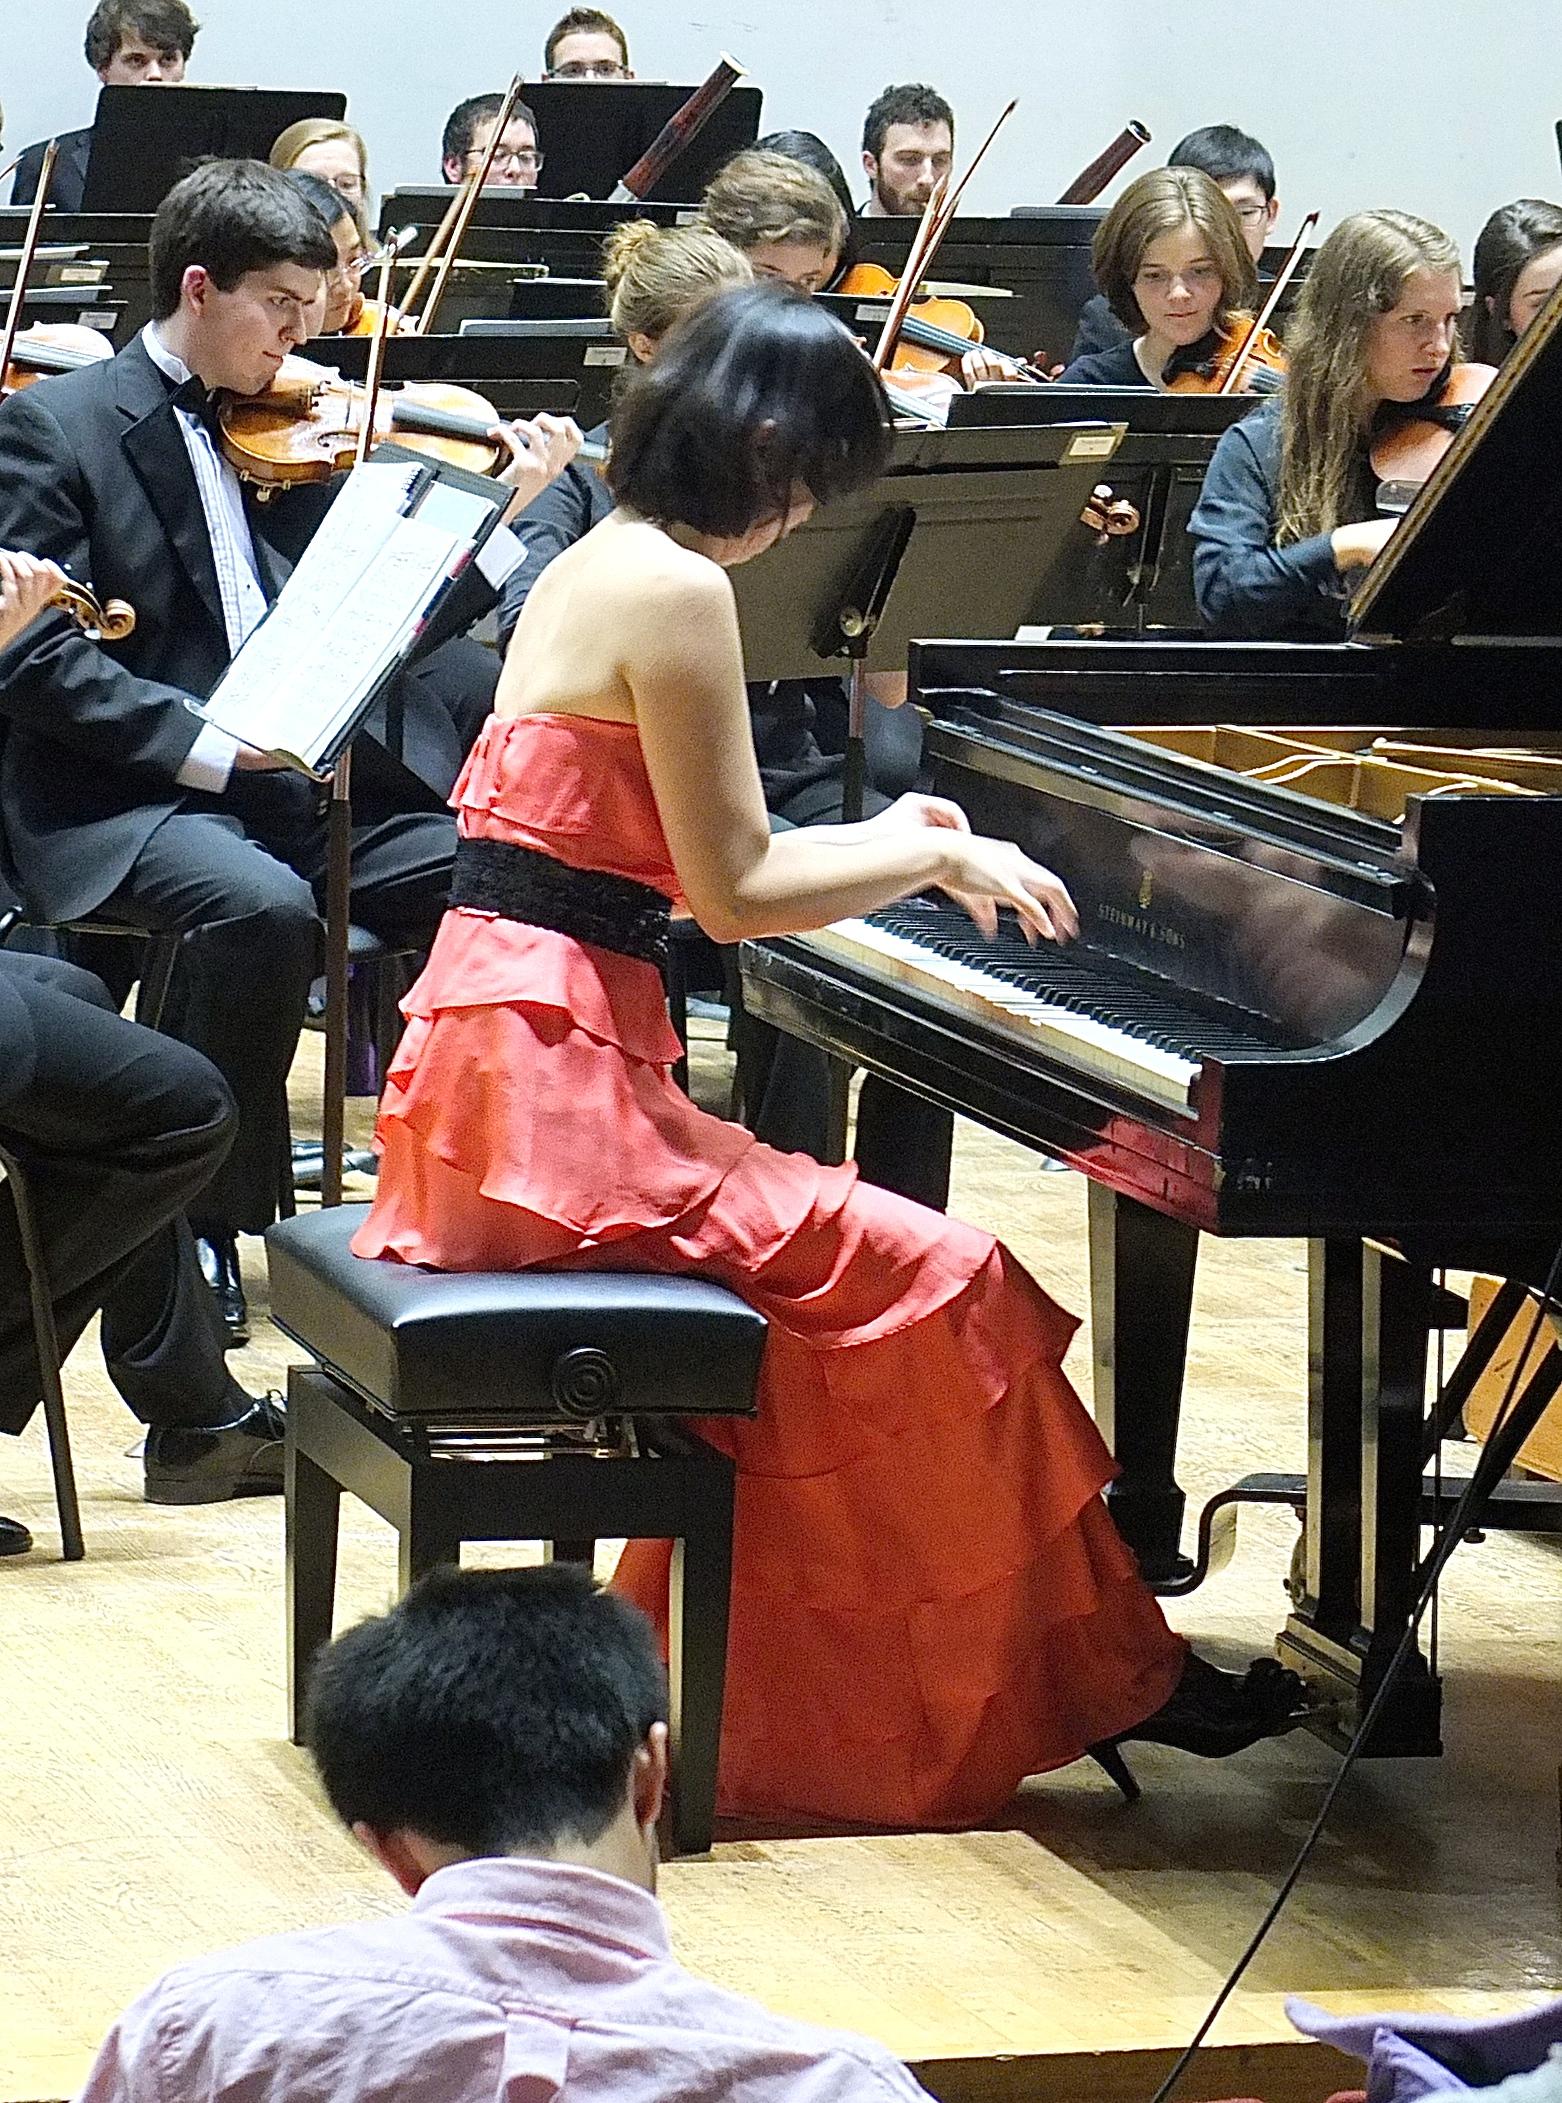 SeungWha Baek playing